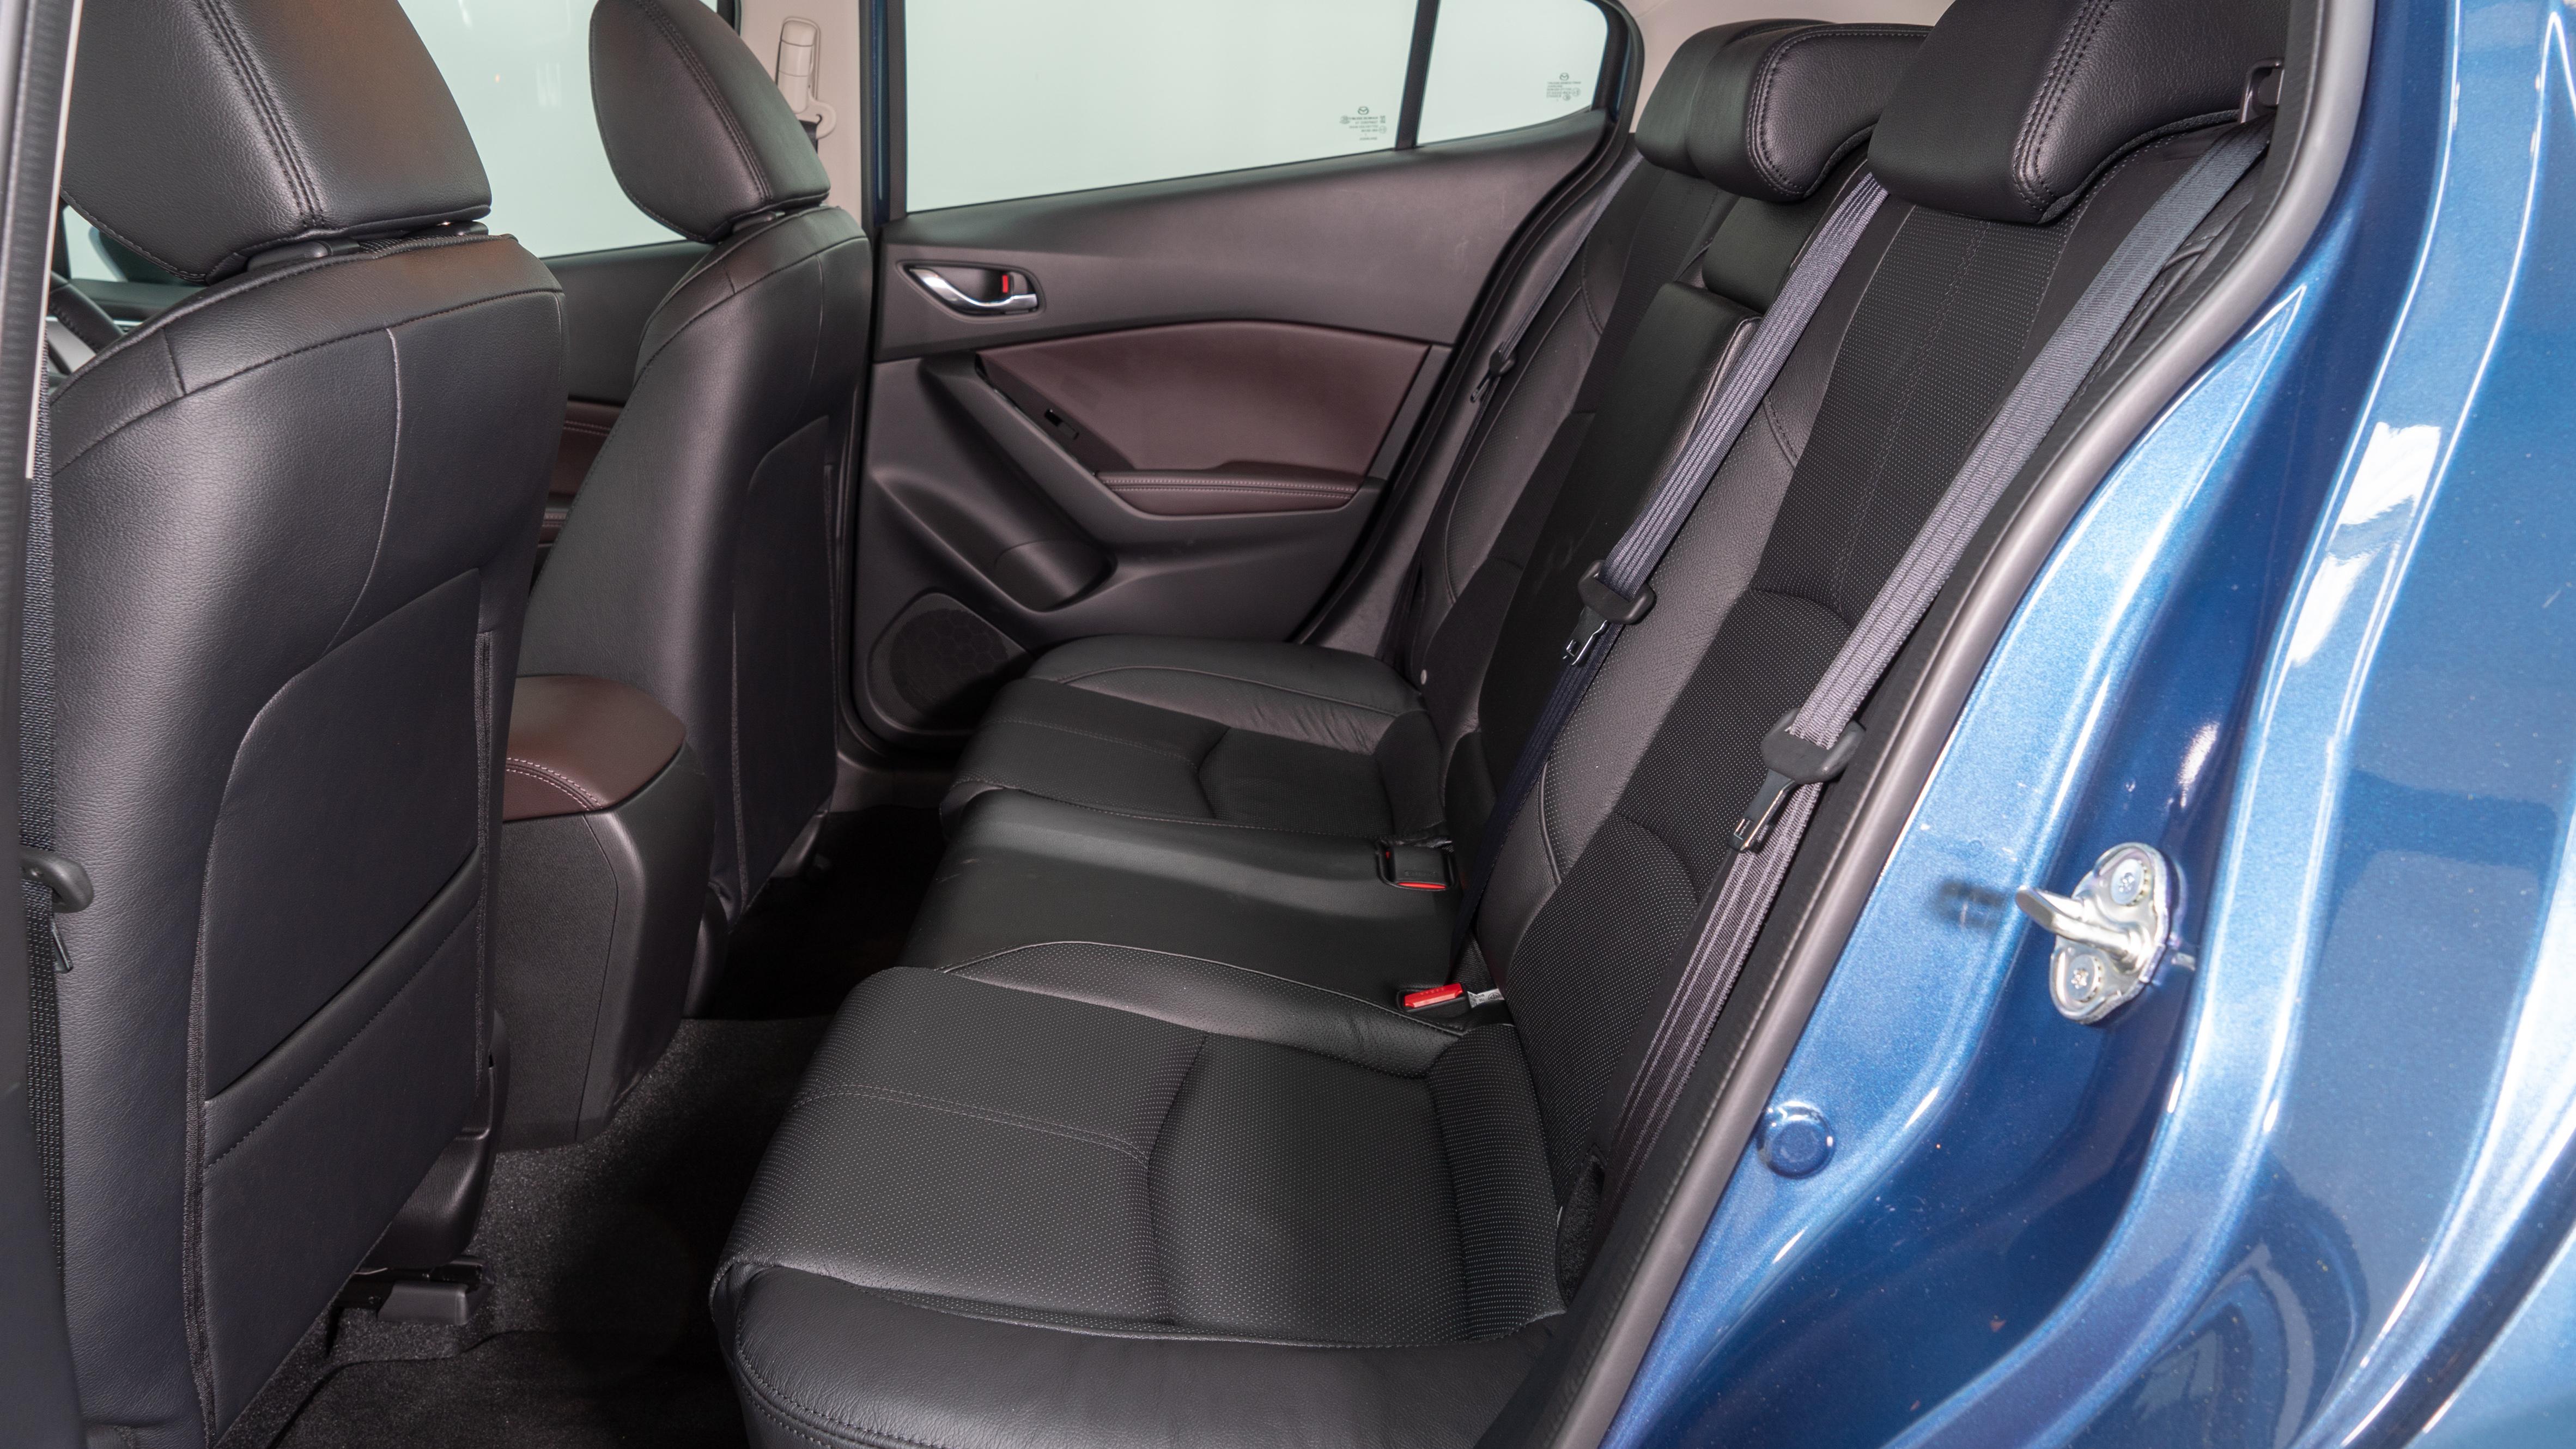 Mazda3 back seat